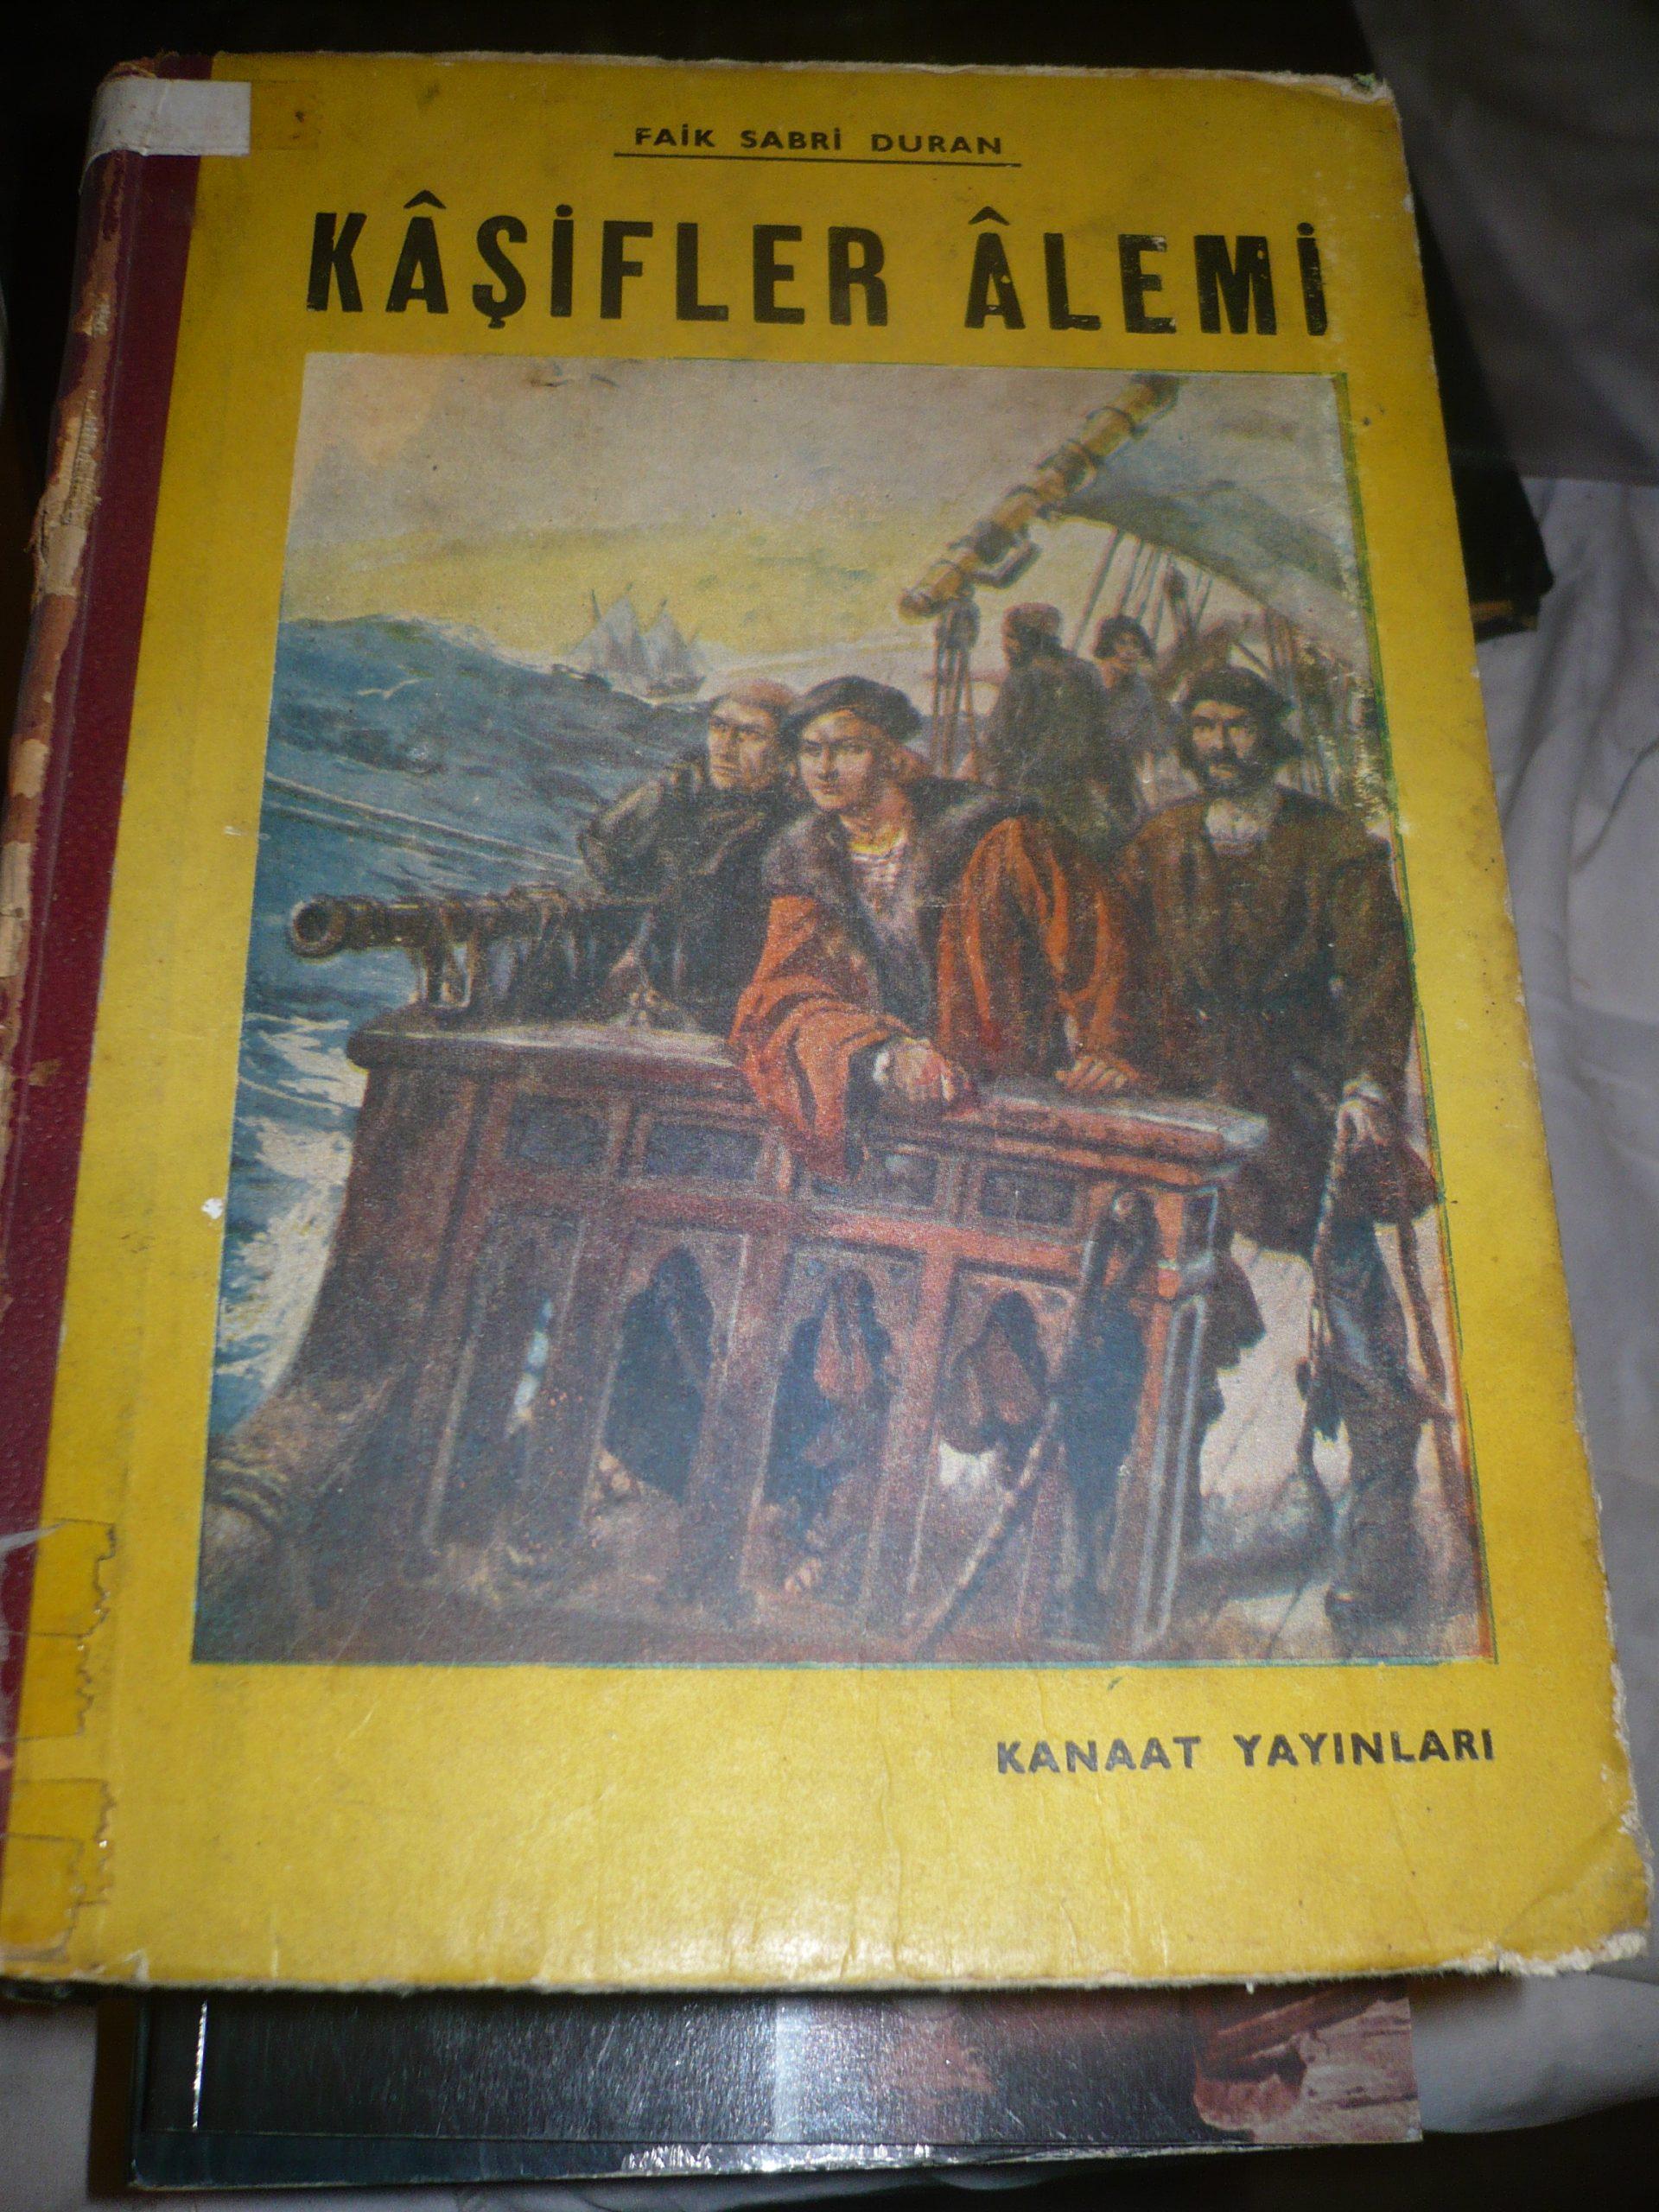 KAŞİFLER ALEMİ/Faik Sabri DURAN/Kanaat yay/30 tl(Tükendi)